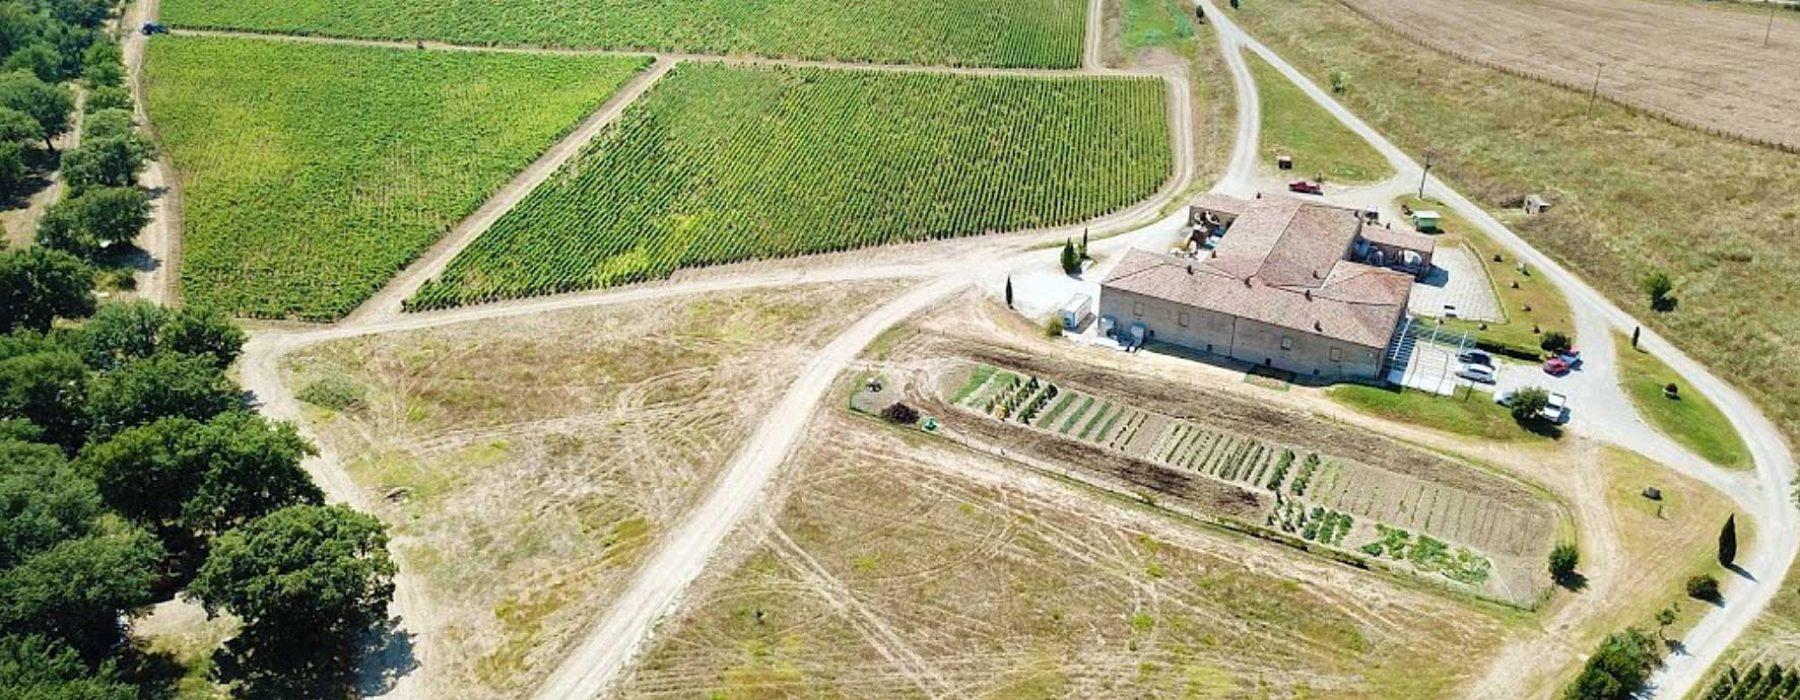 Trinoro e Passopisciano: 成功したワインのためにトスカーナからシチリアへ